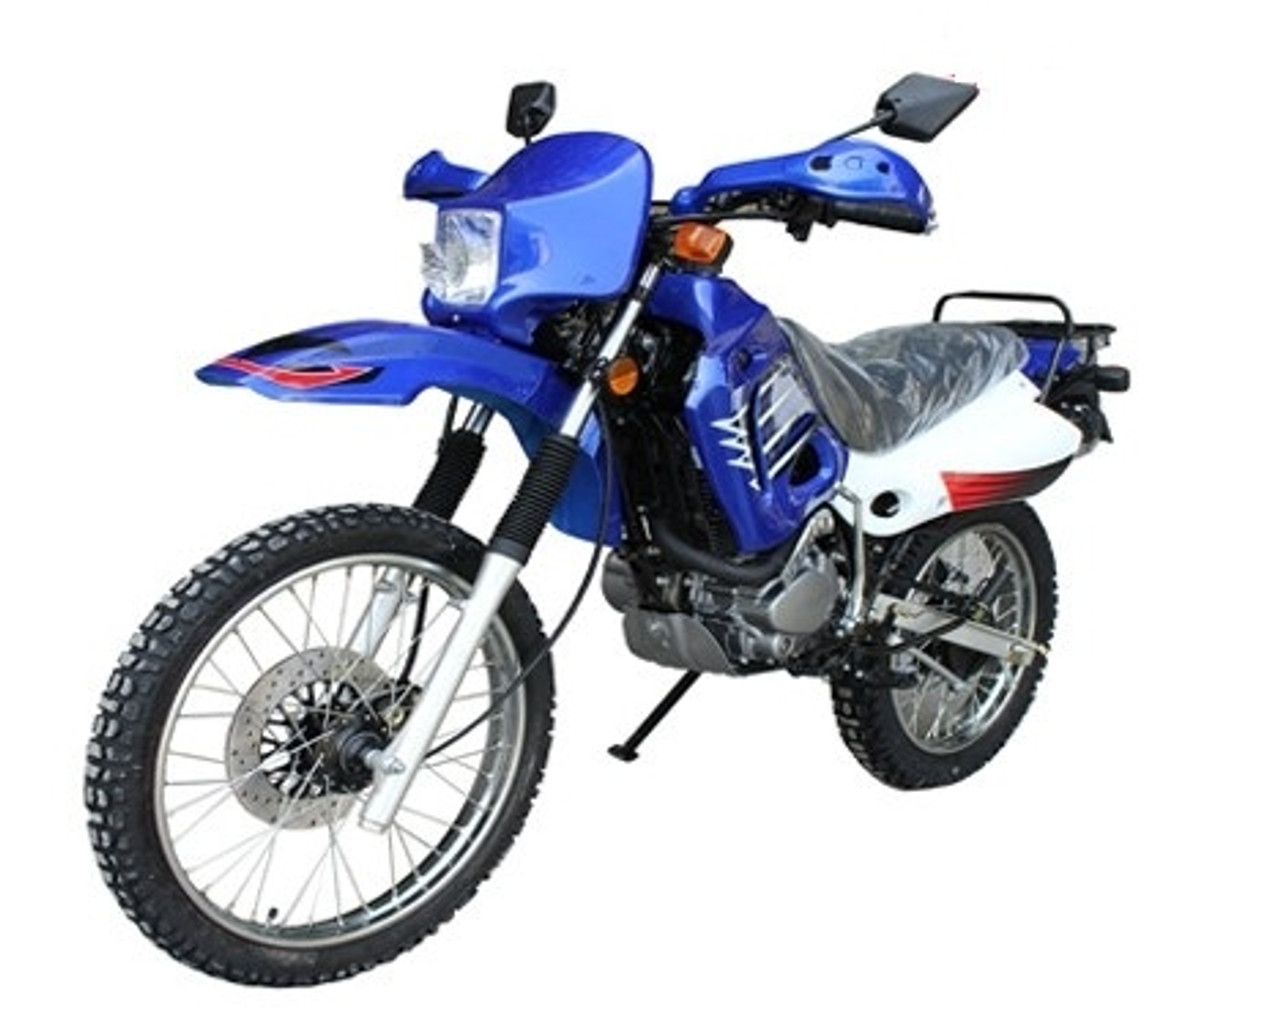 DB-07-200 dirt bike 200cc